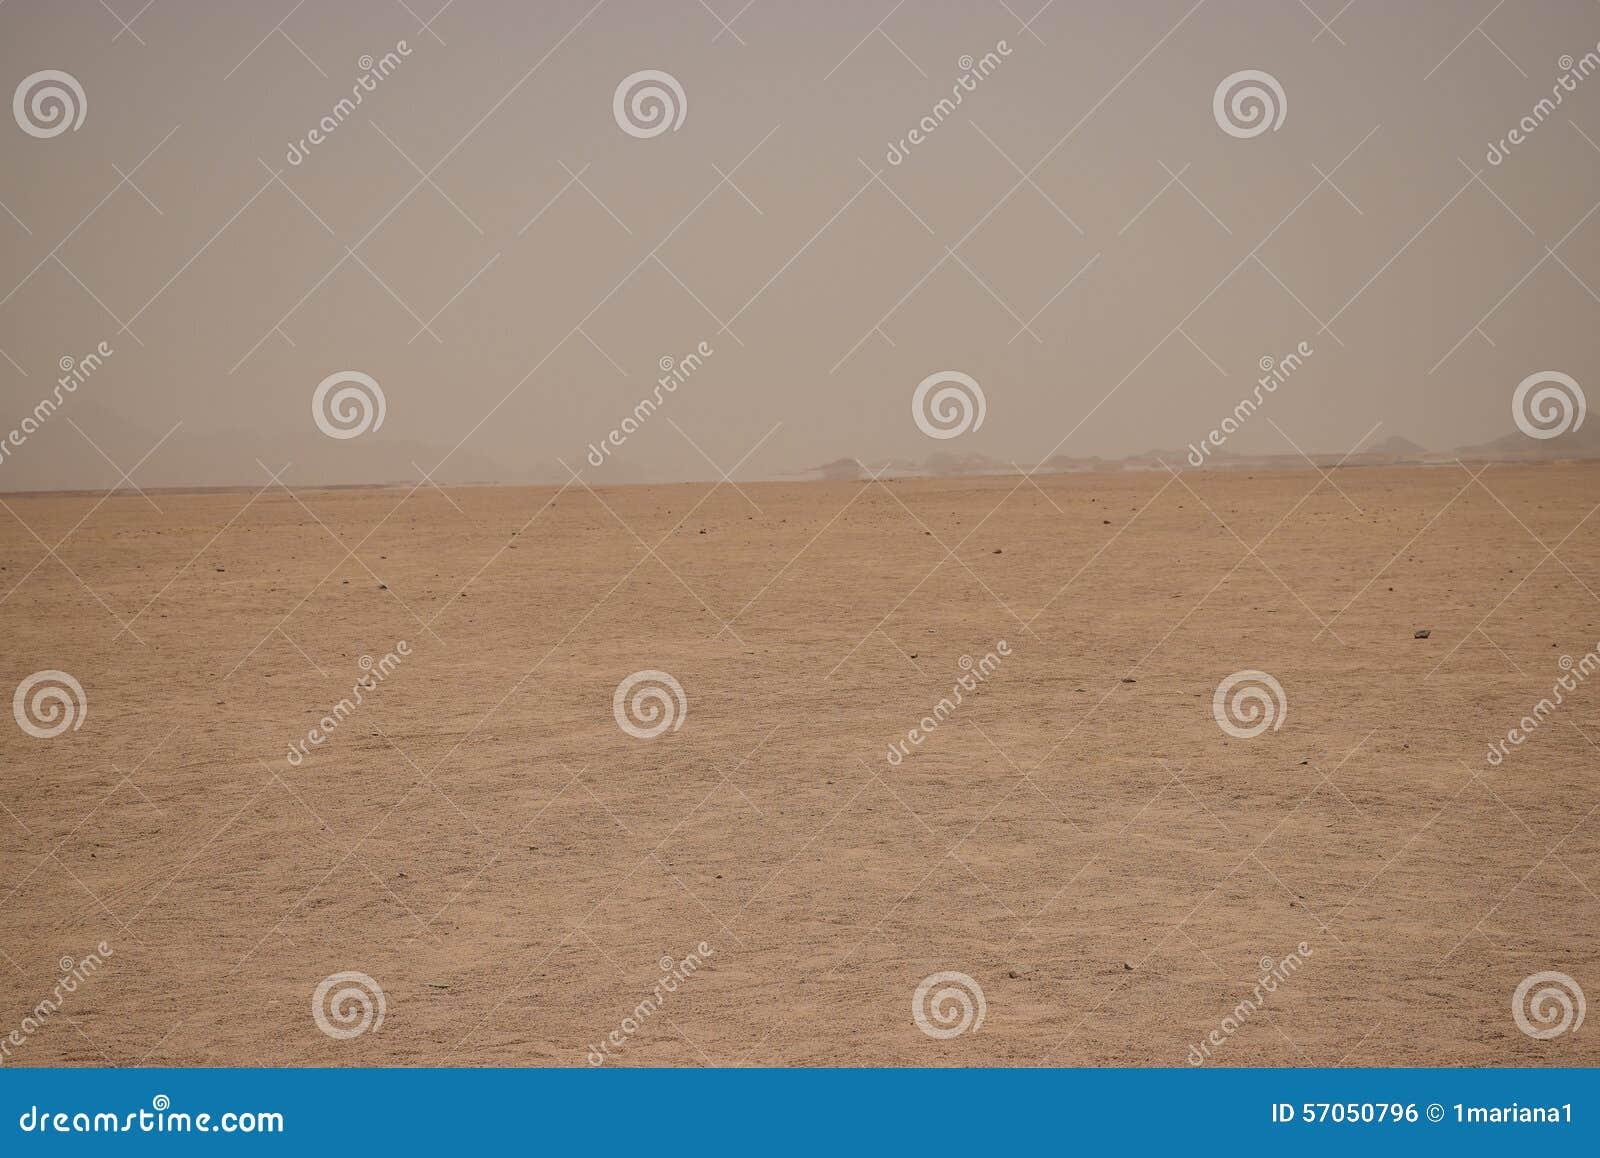 Luchtspiegeling in de woestijn